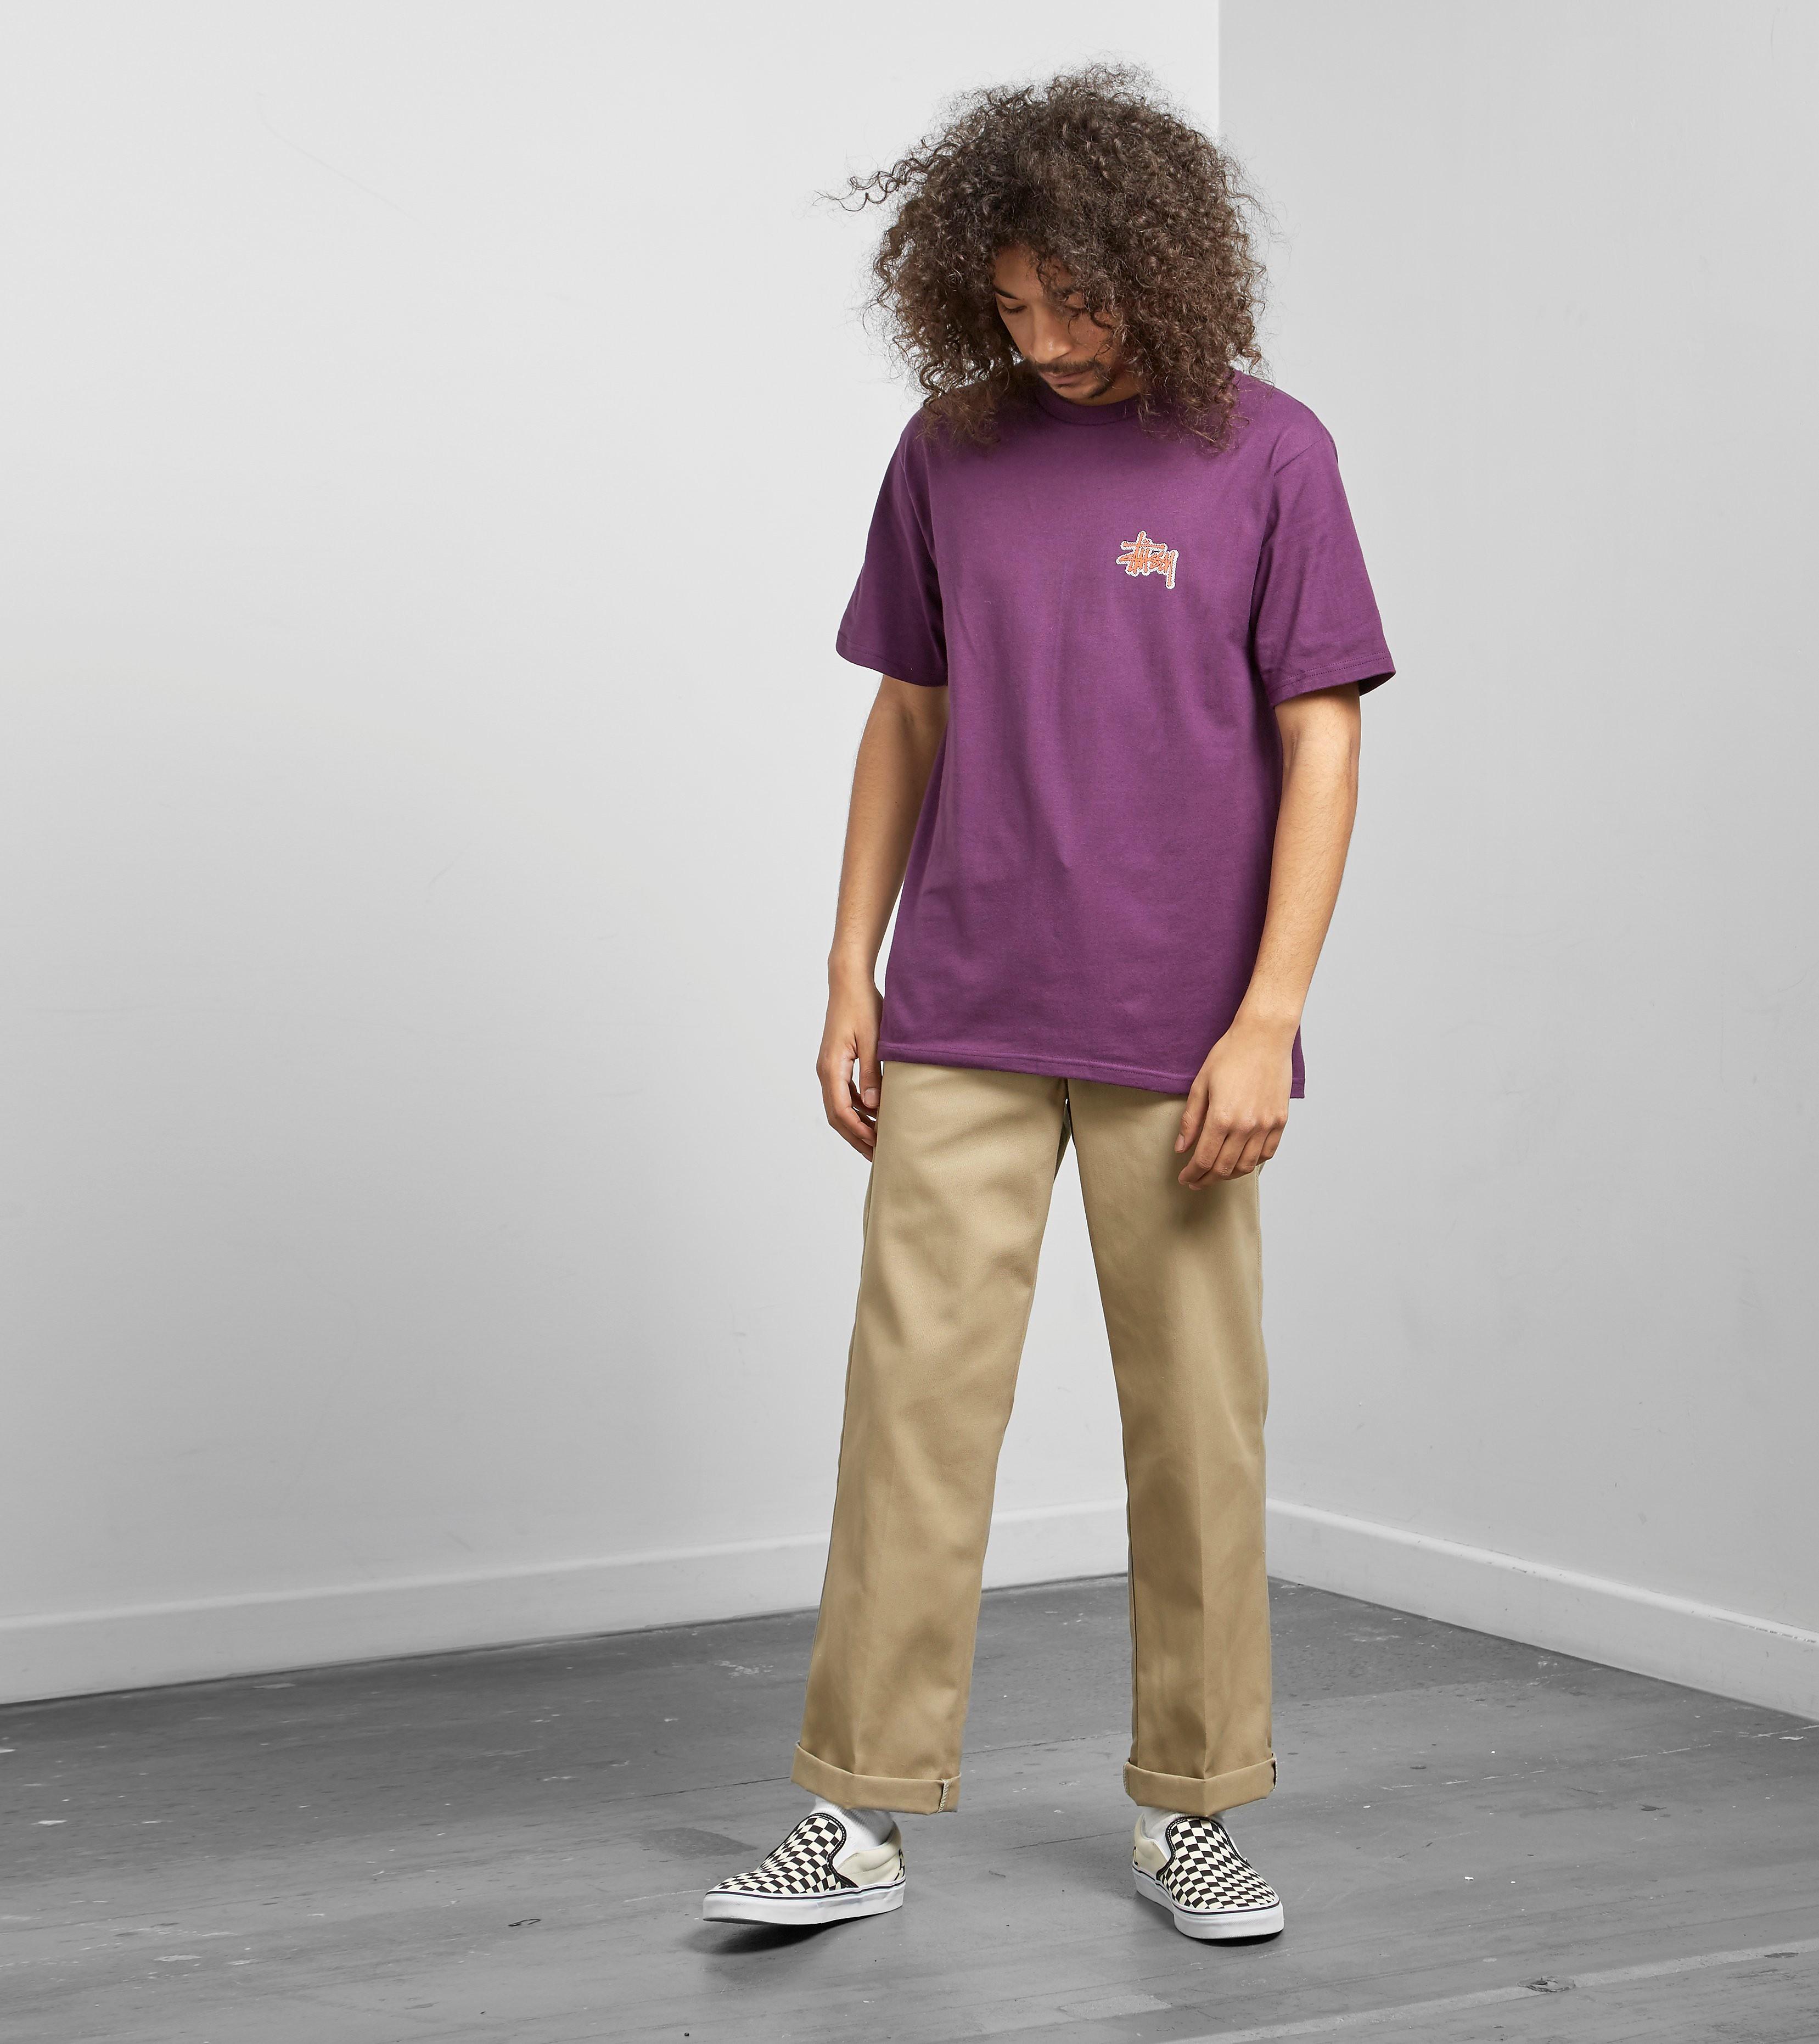 Stussy Checkers T-Shirt